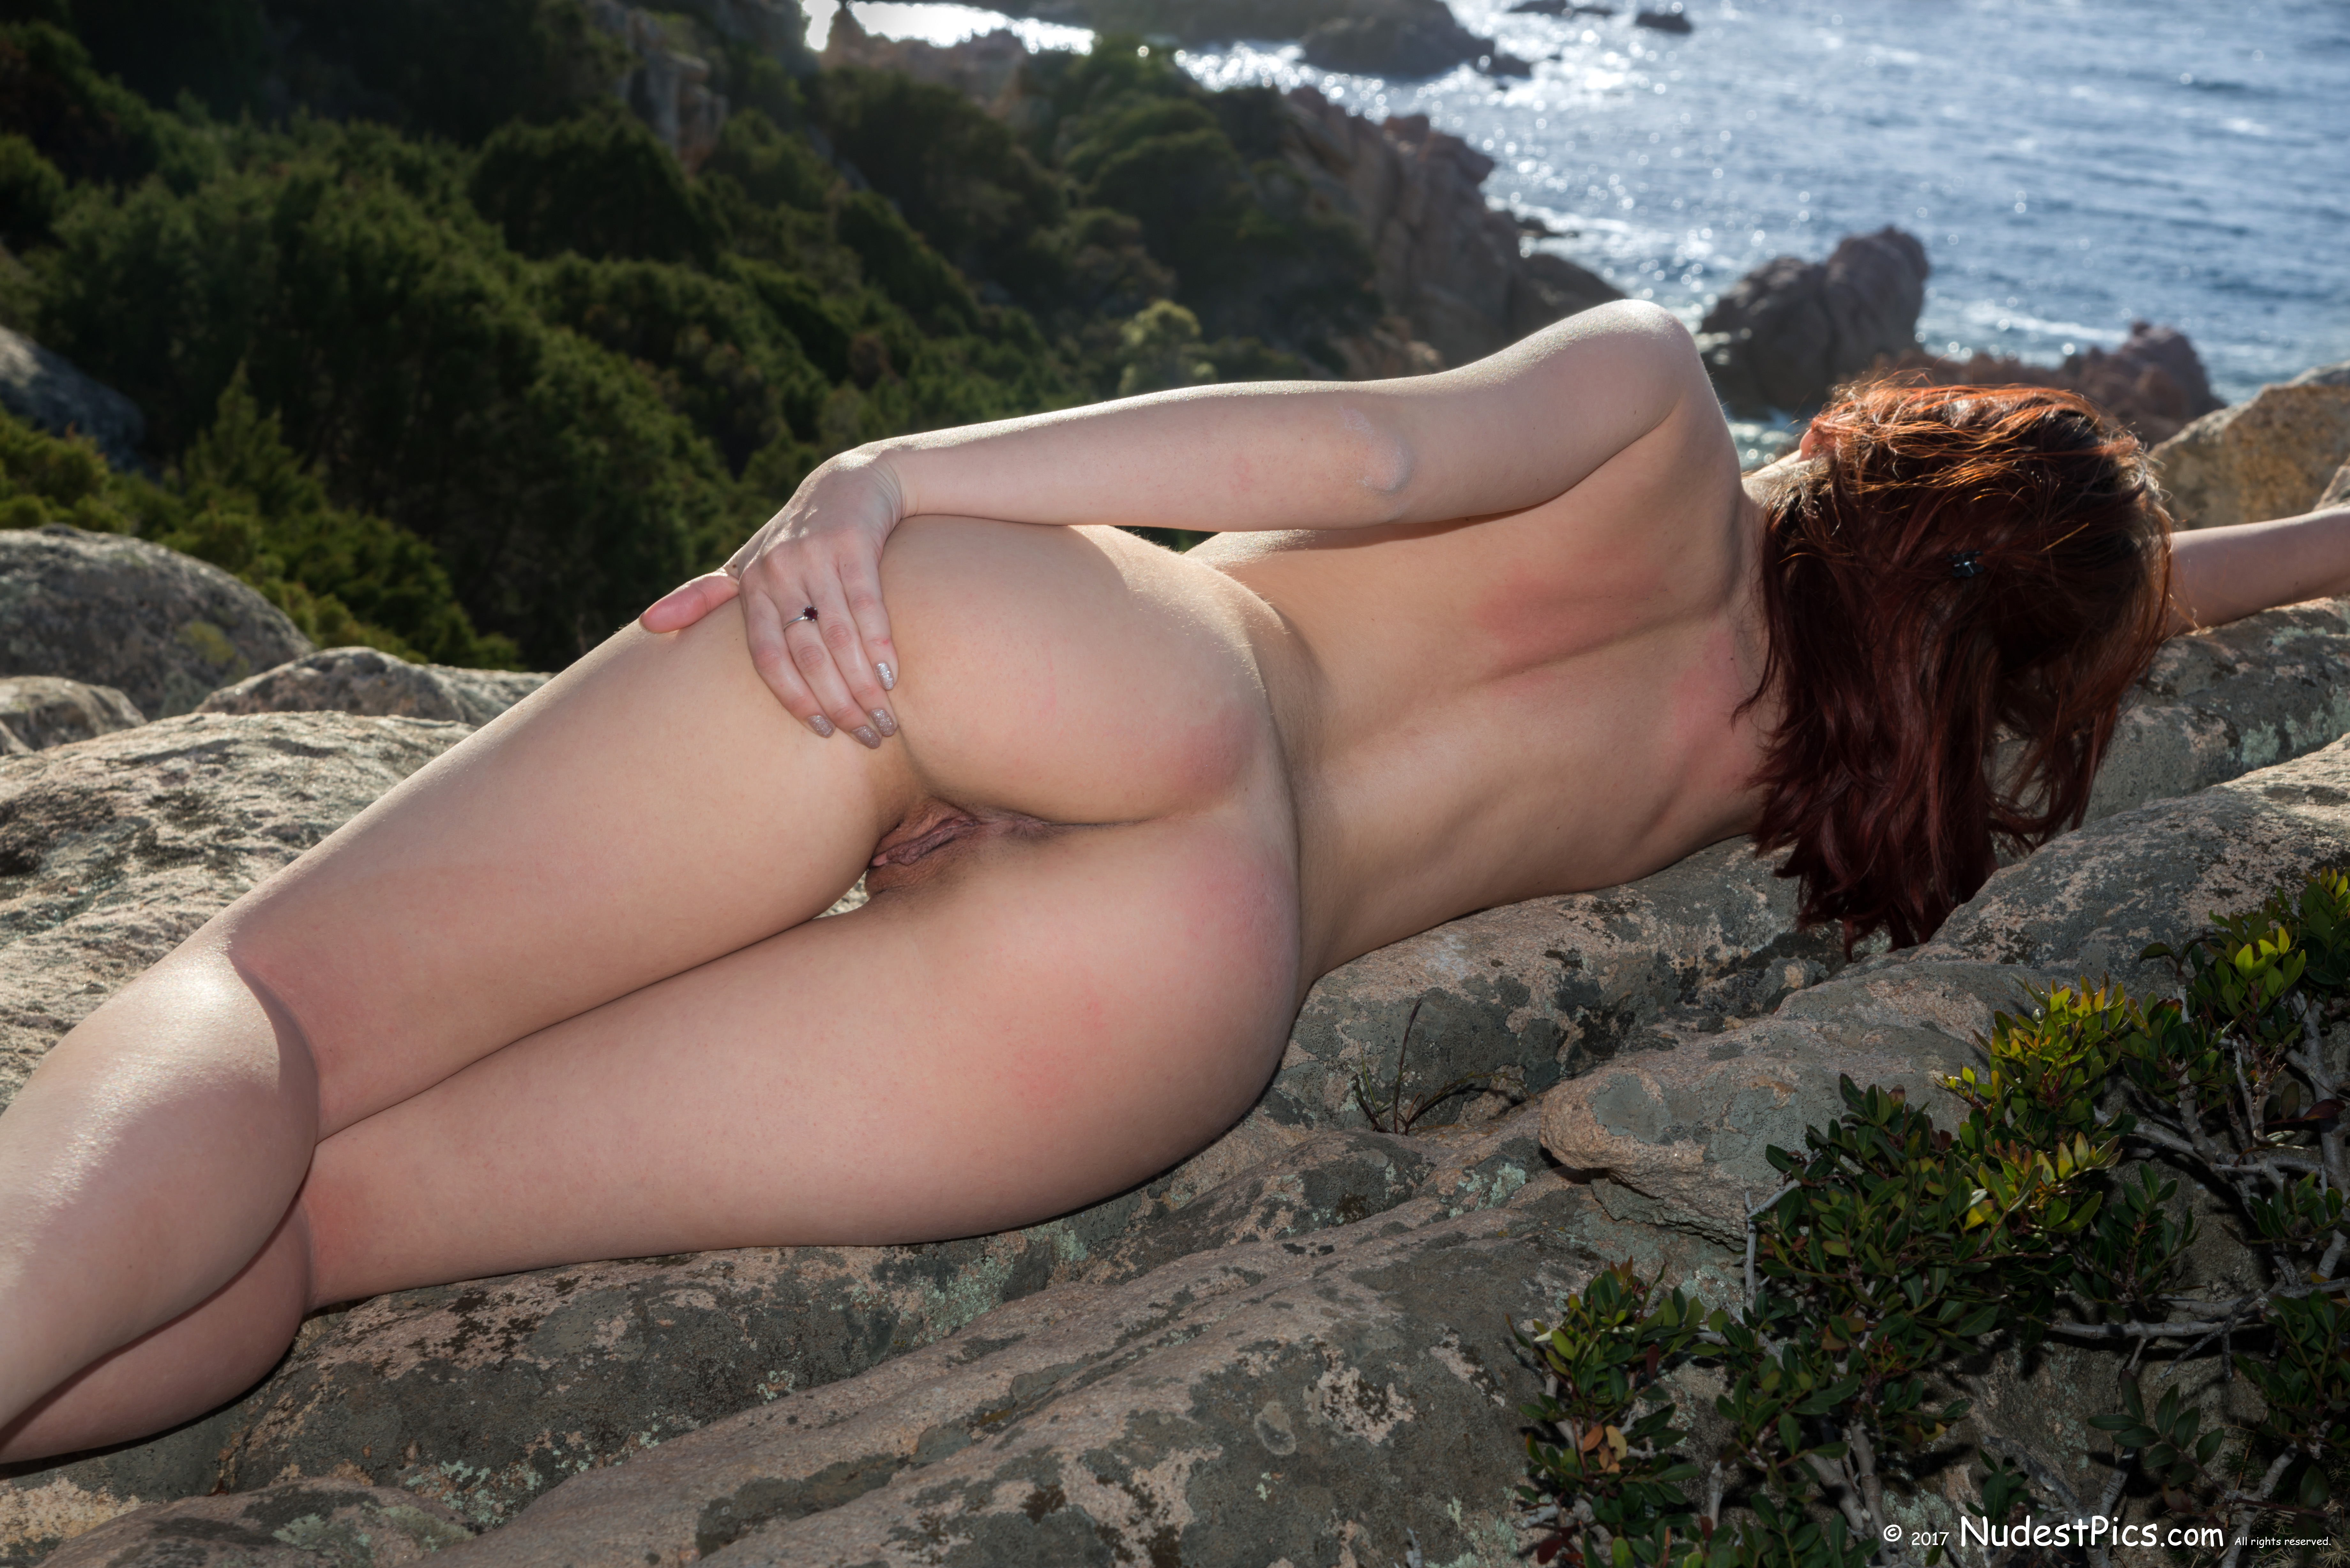 Naughty Nudist Spreading Ass Sunbathing on Rocks HD